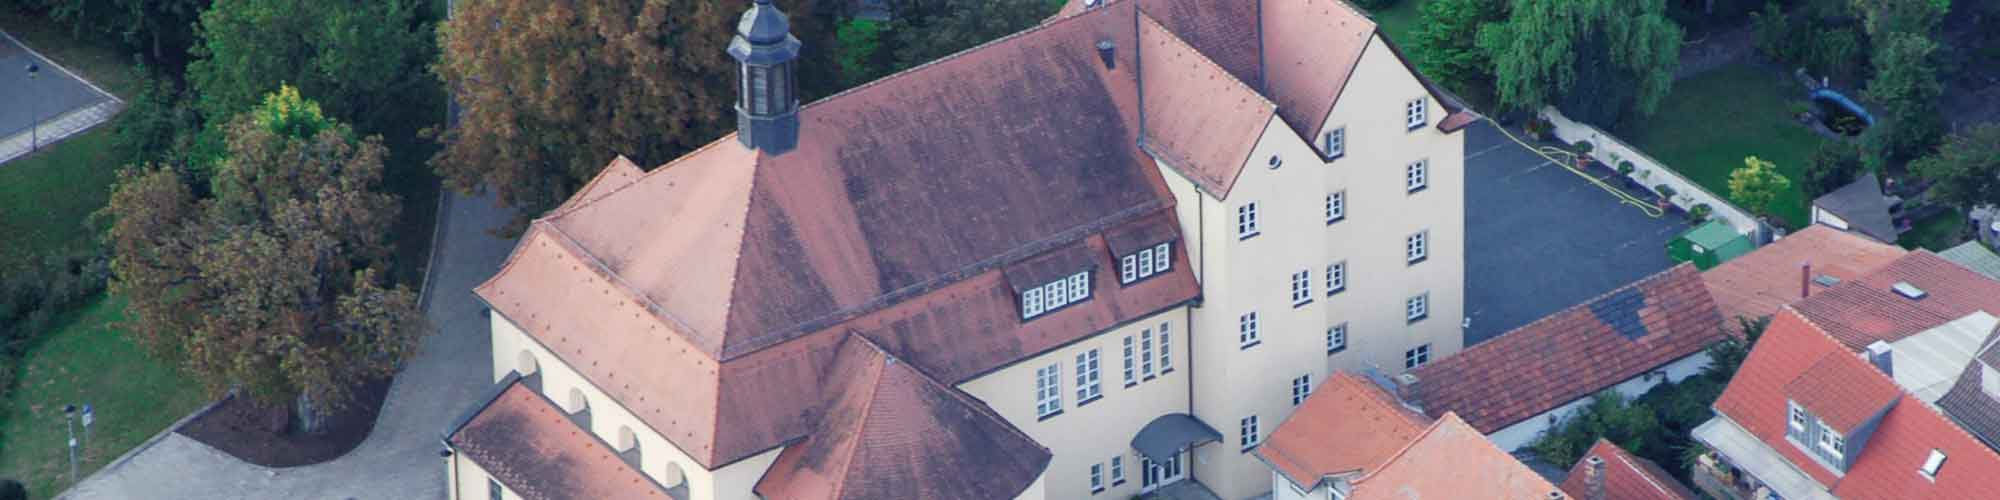 slider4-muehlbach